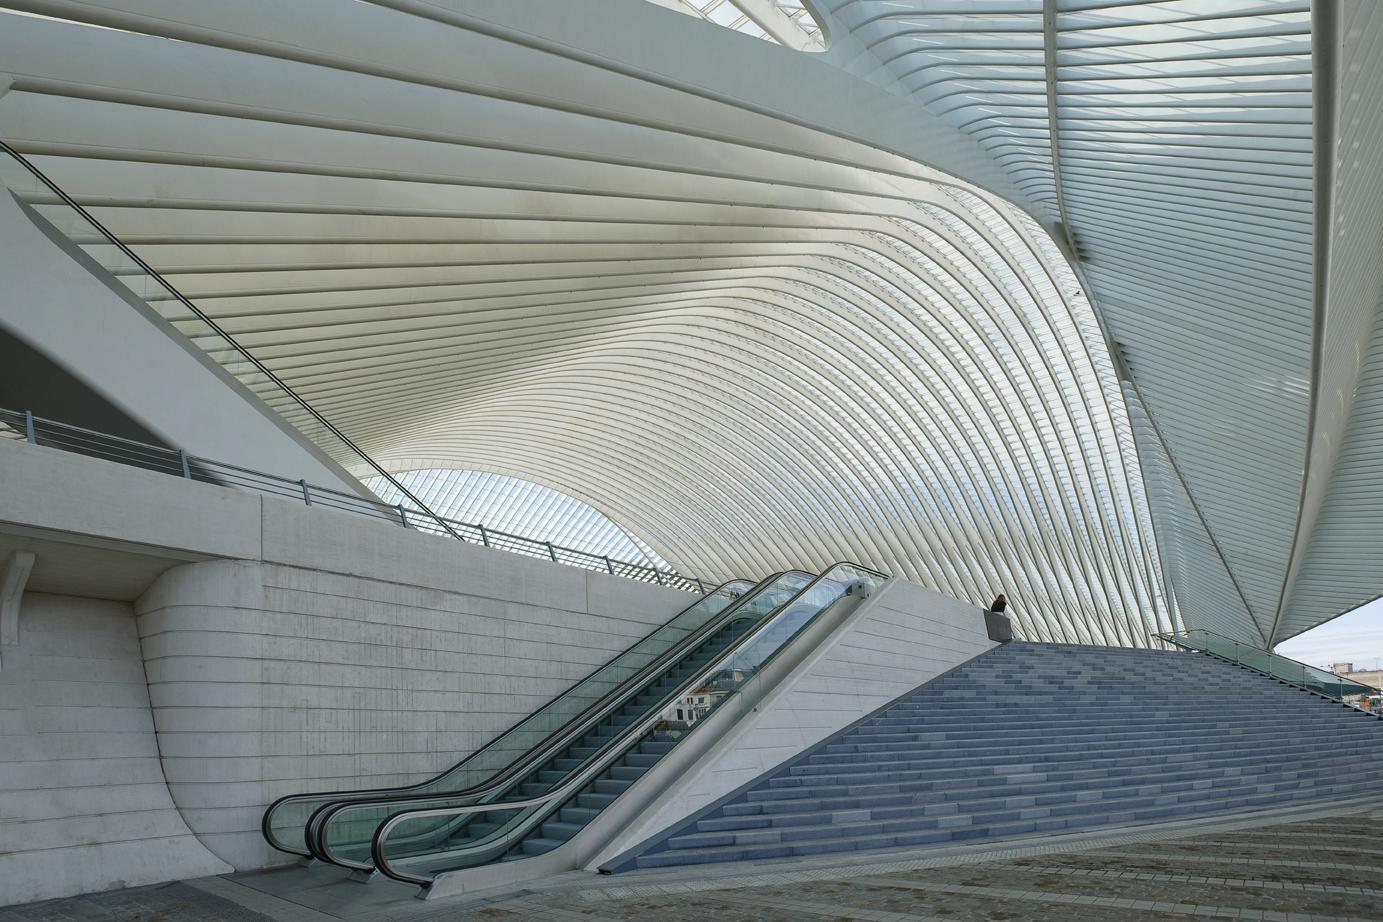 architect santiago calatrava essay Santiago calatrava valls is a spanish/swiss architect, structural engineer, sculptor and painter he has offices in new york city, dubai, and zürich.